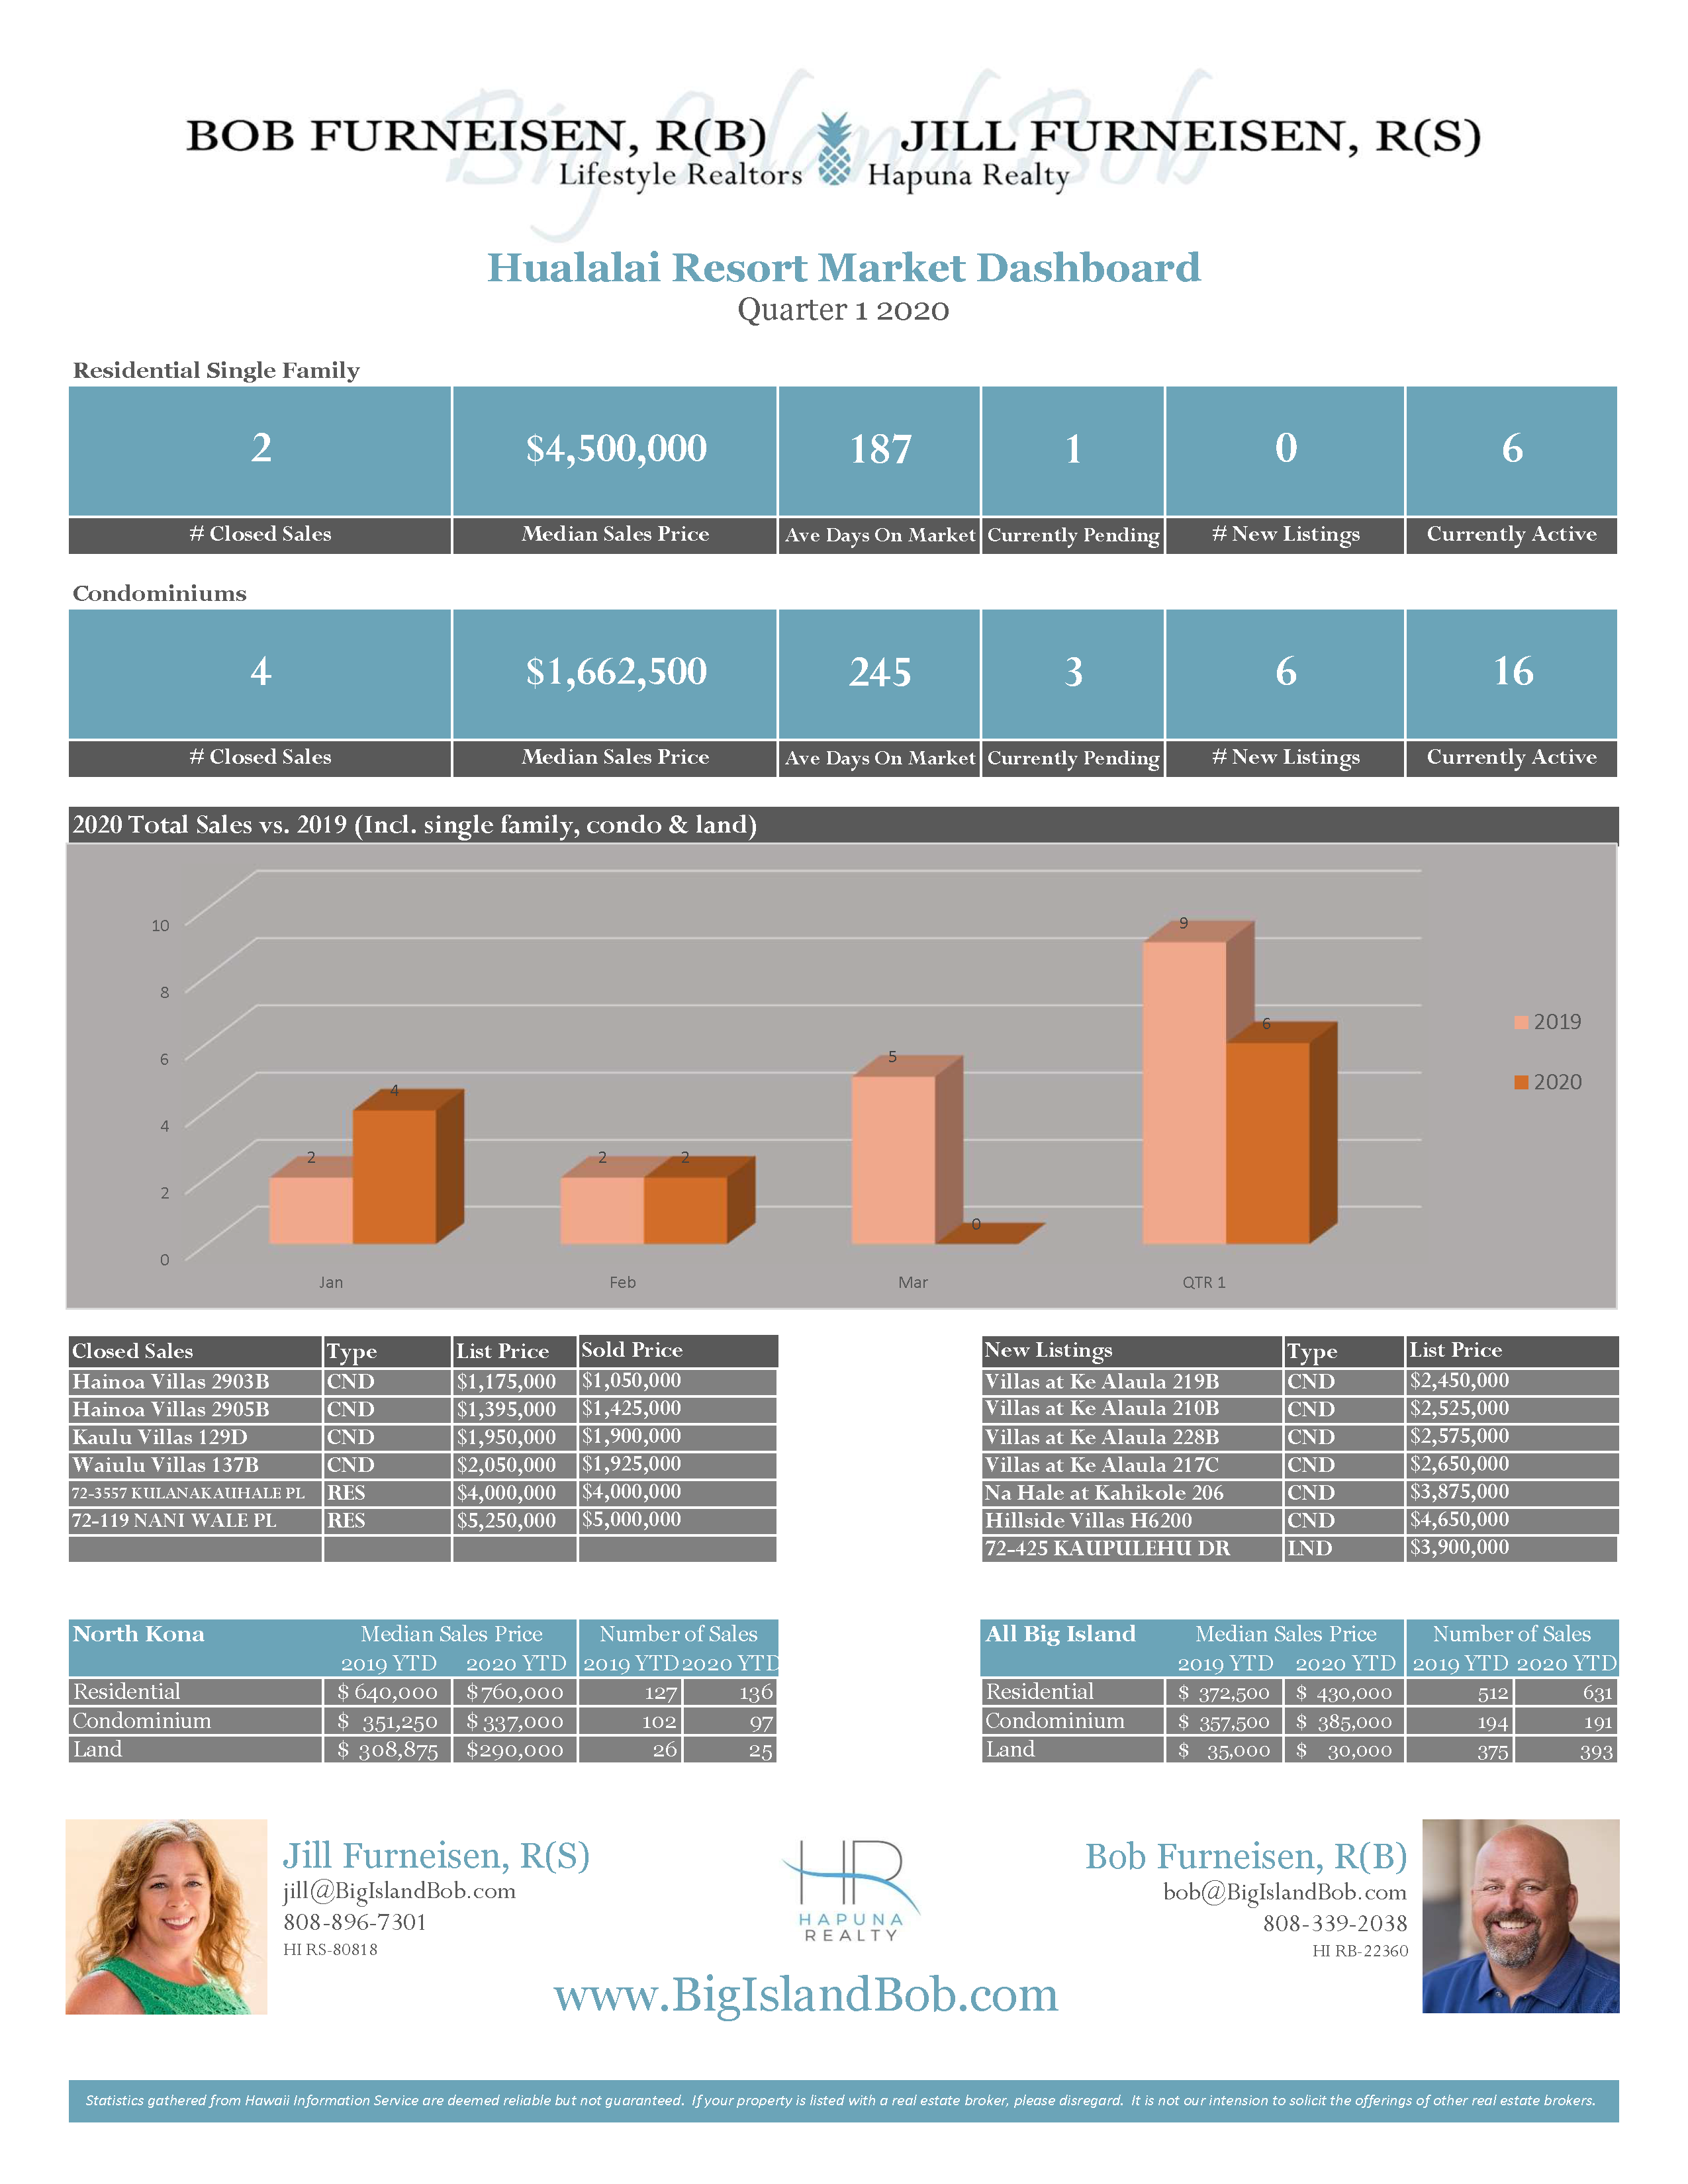 Hualalai Resort Quarter 1 2020 Real Estate Market Dashboard